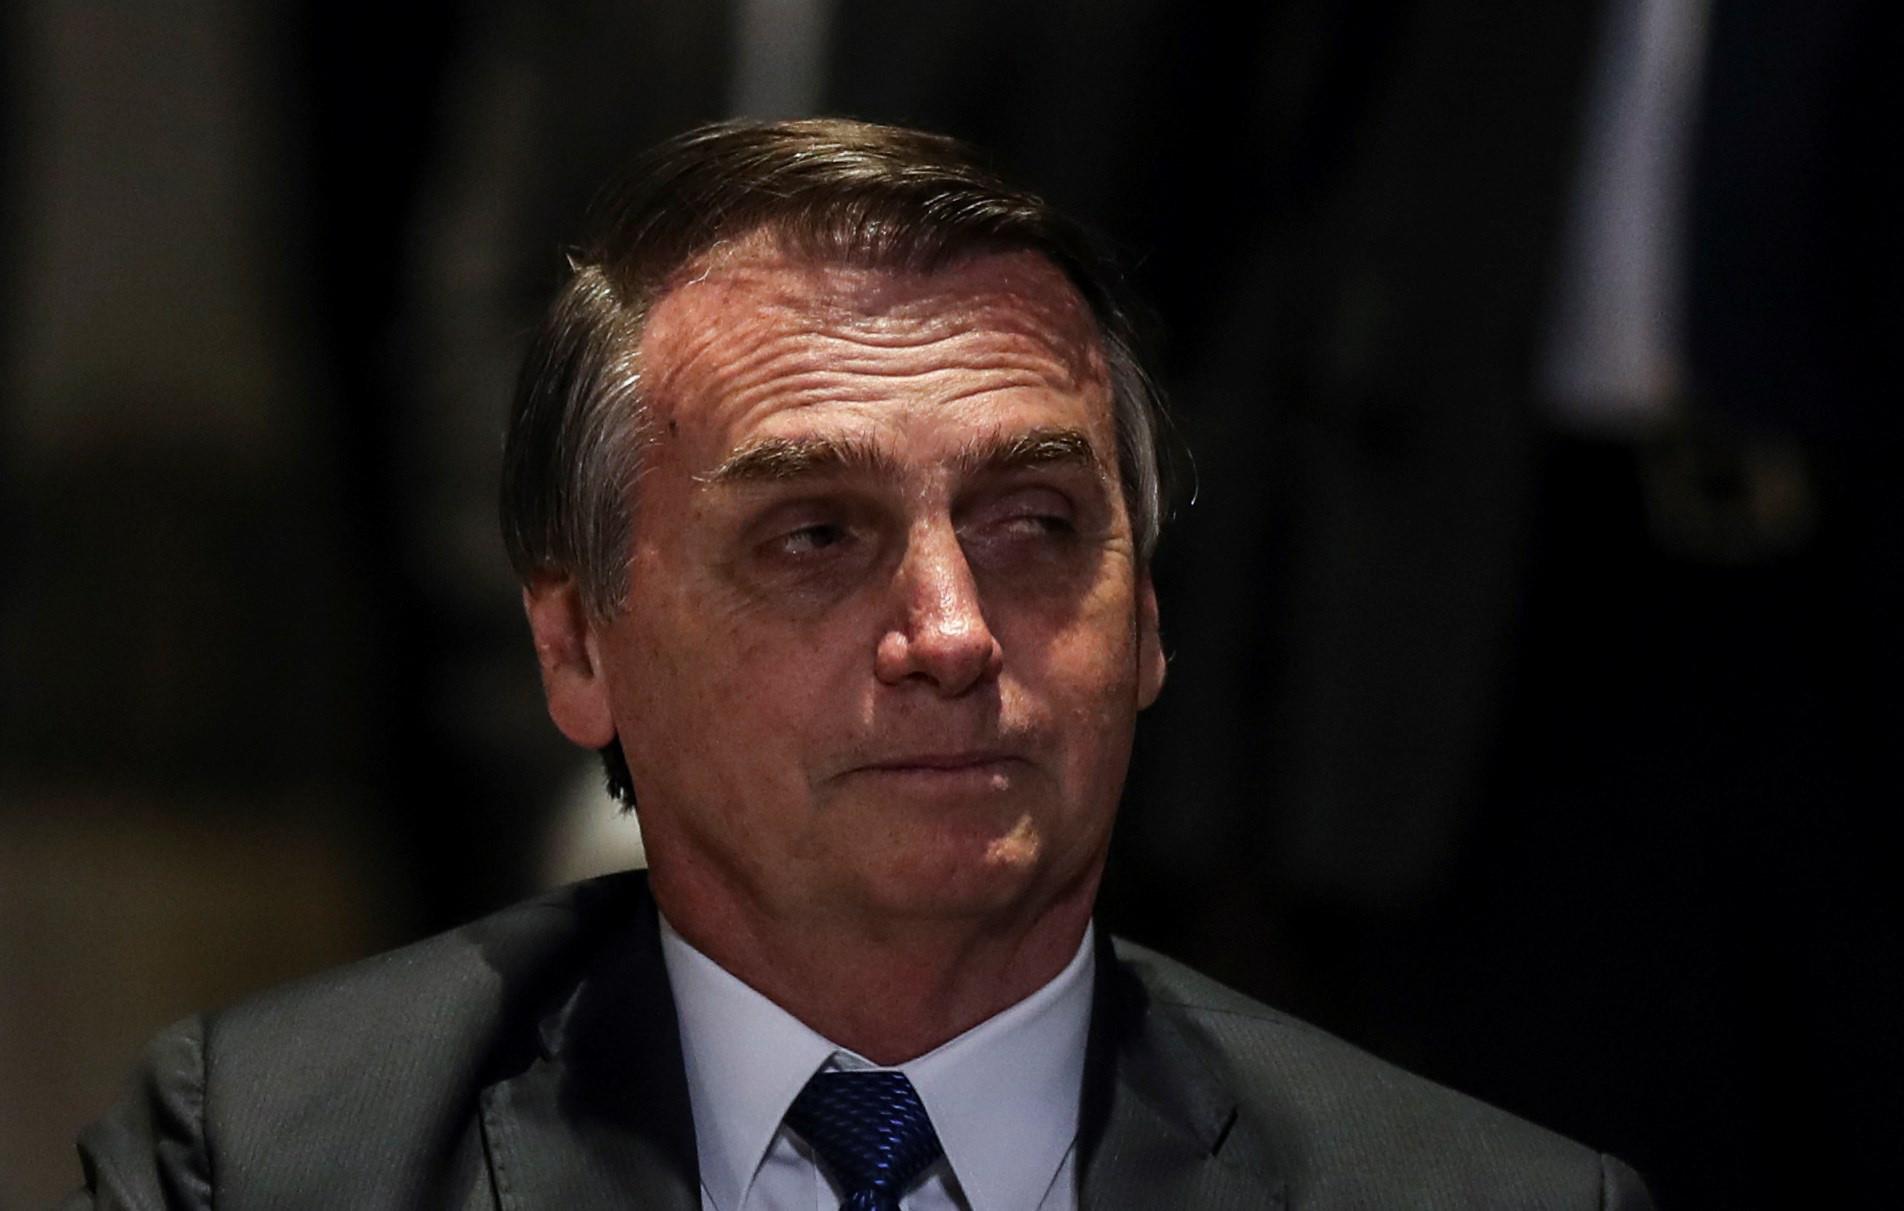 Bolsonaro diz que vai manter passaporte diplomático a líder da IURD